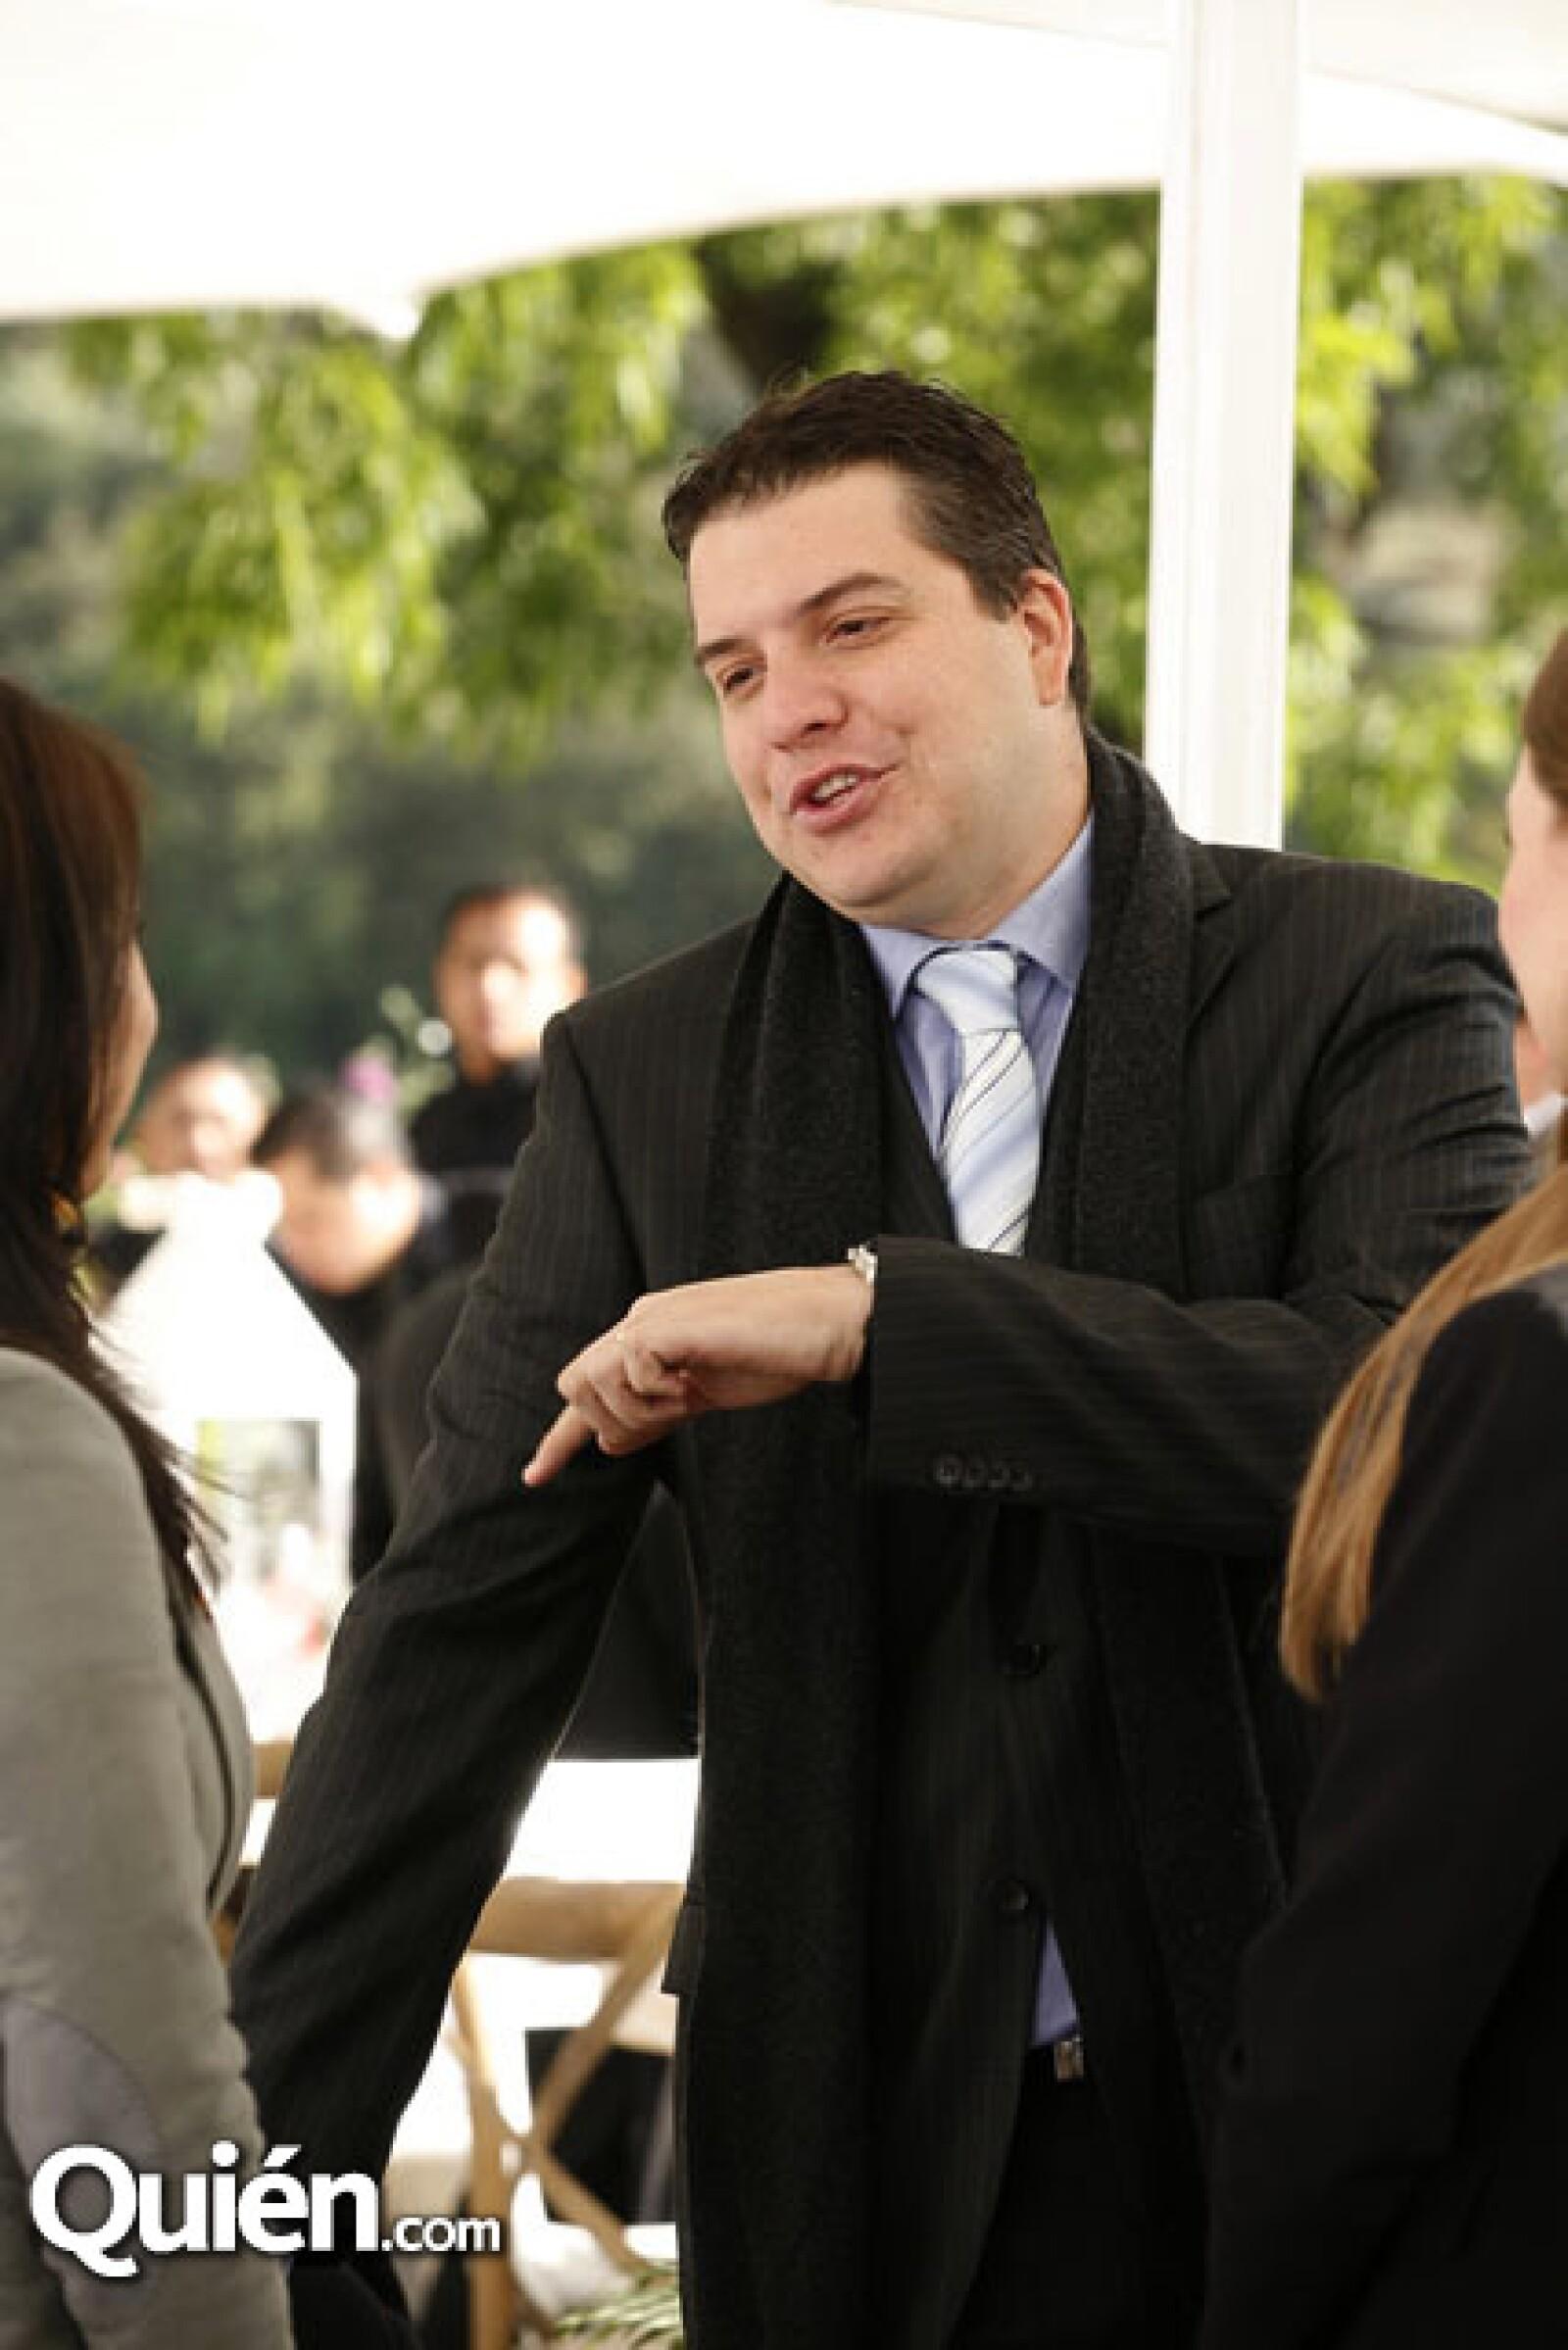 Lucas Echavarria